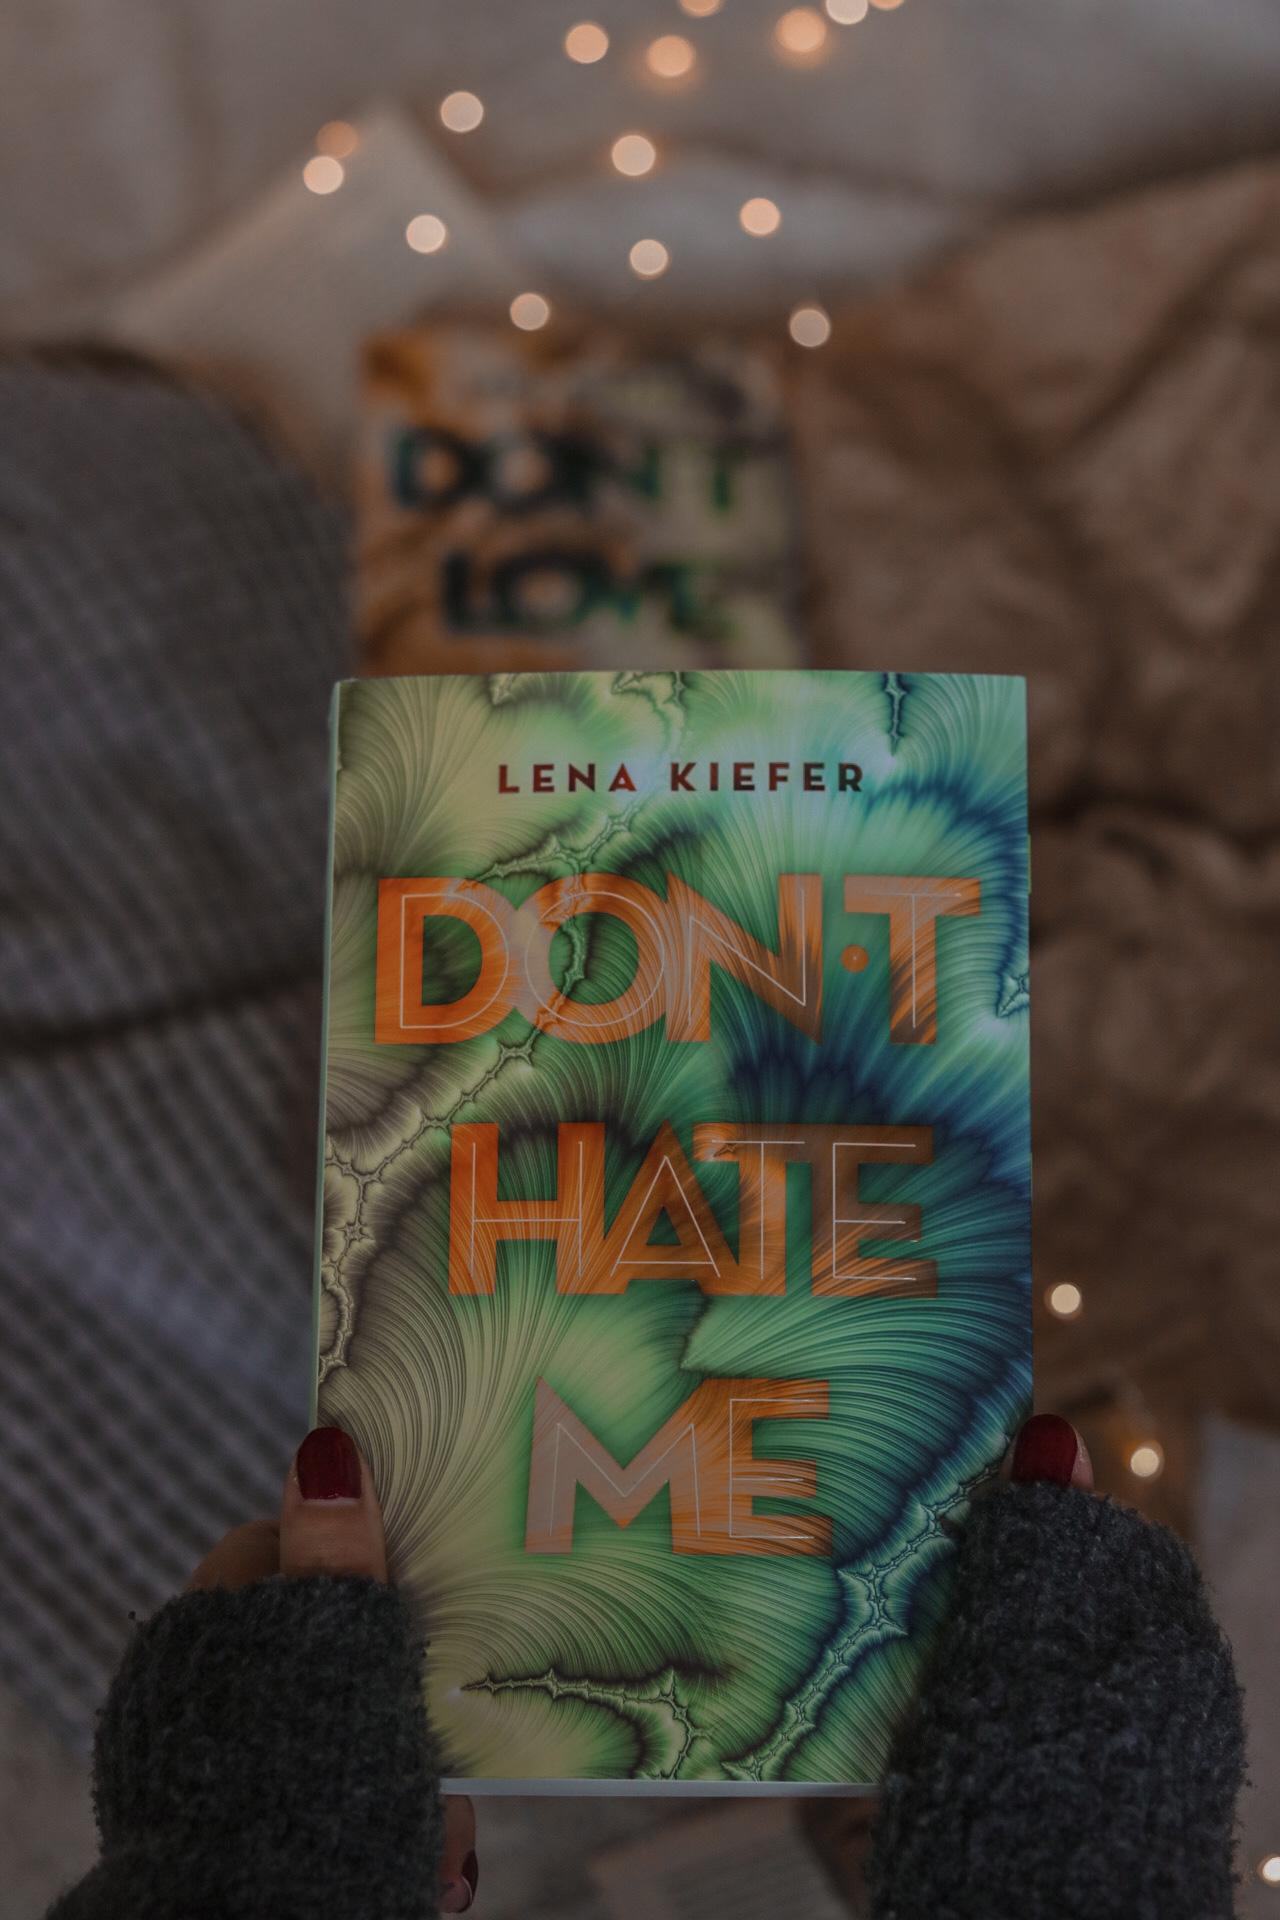 Don't hate me – Don't Reihe #2 | Lena Kiefer